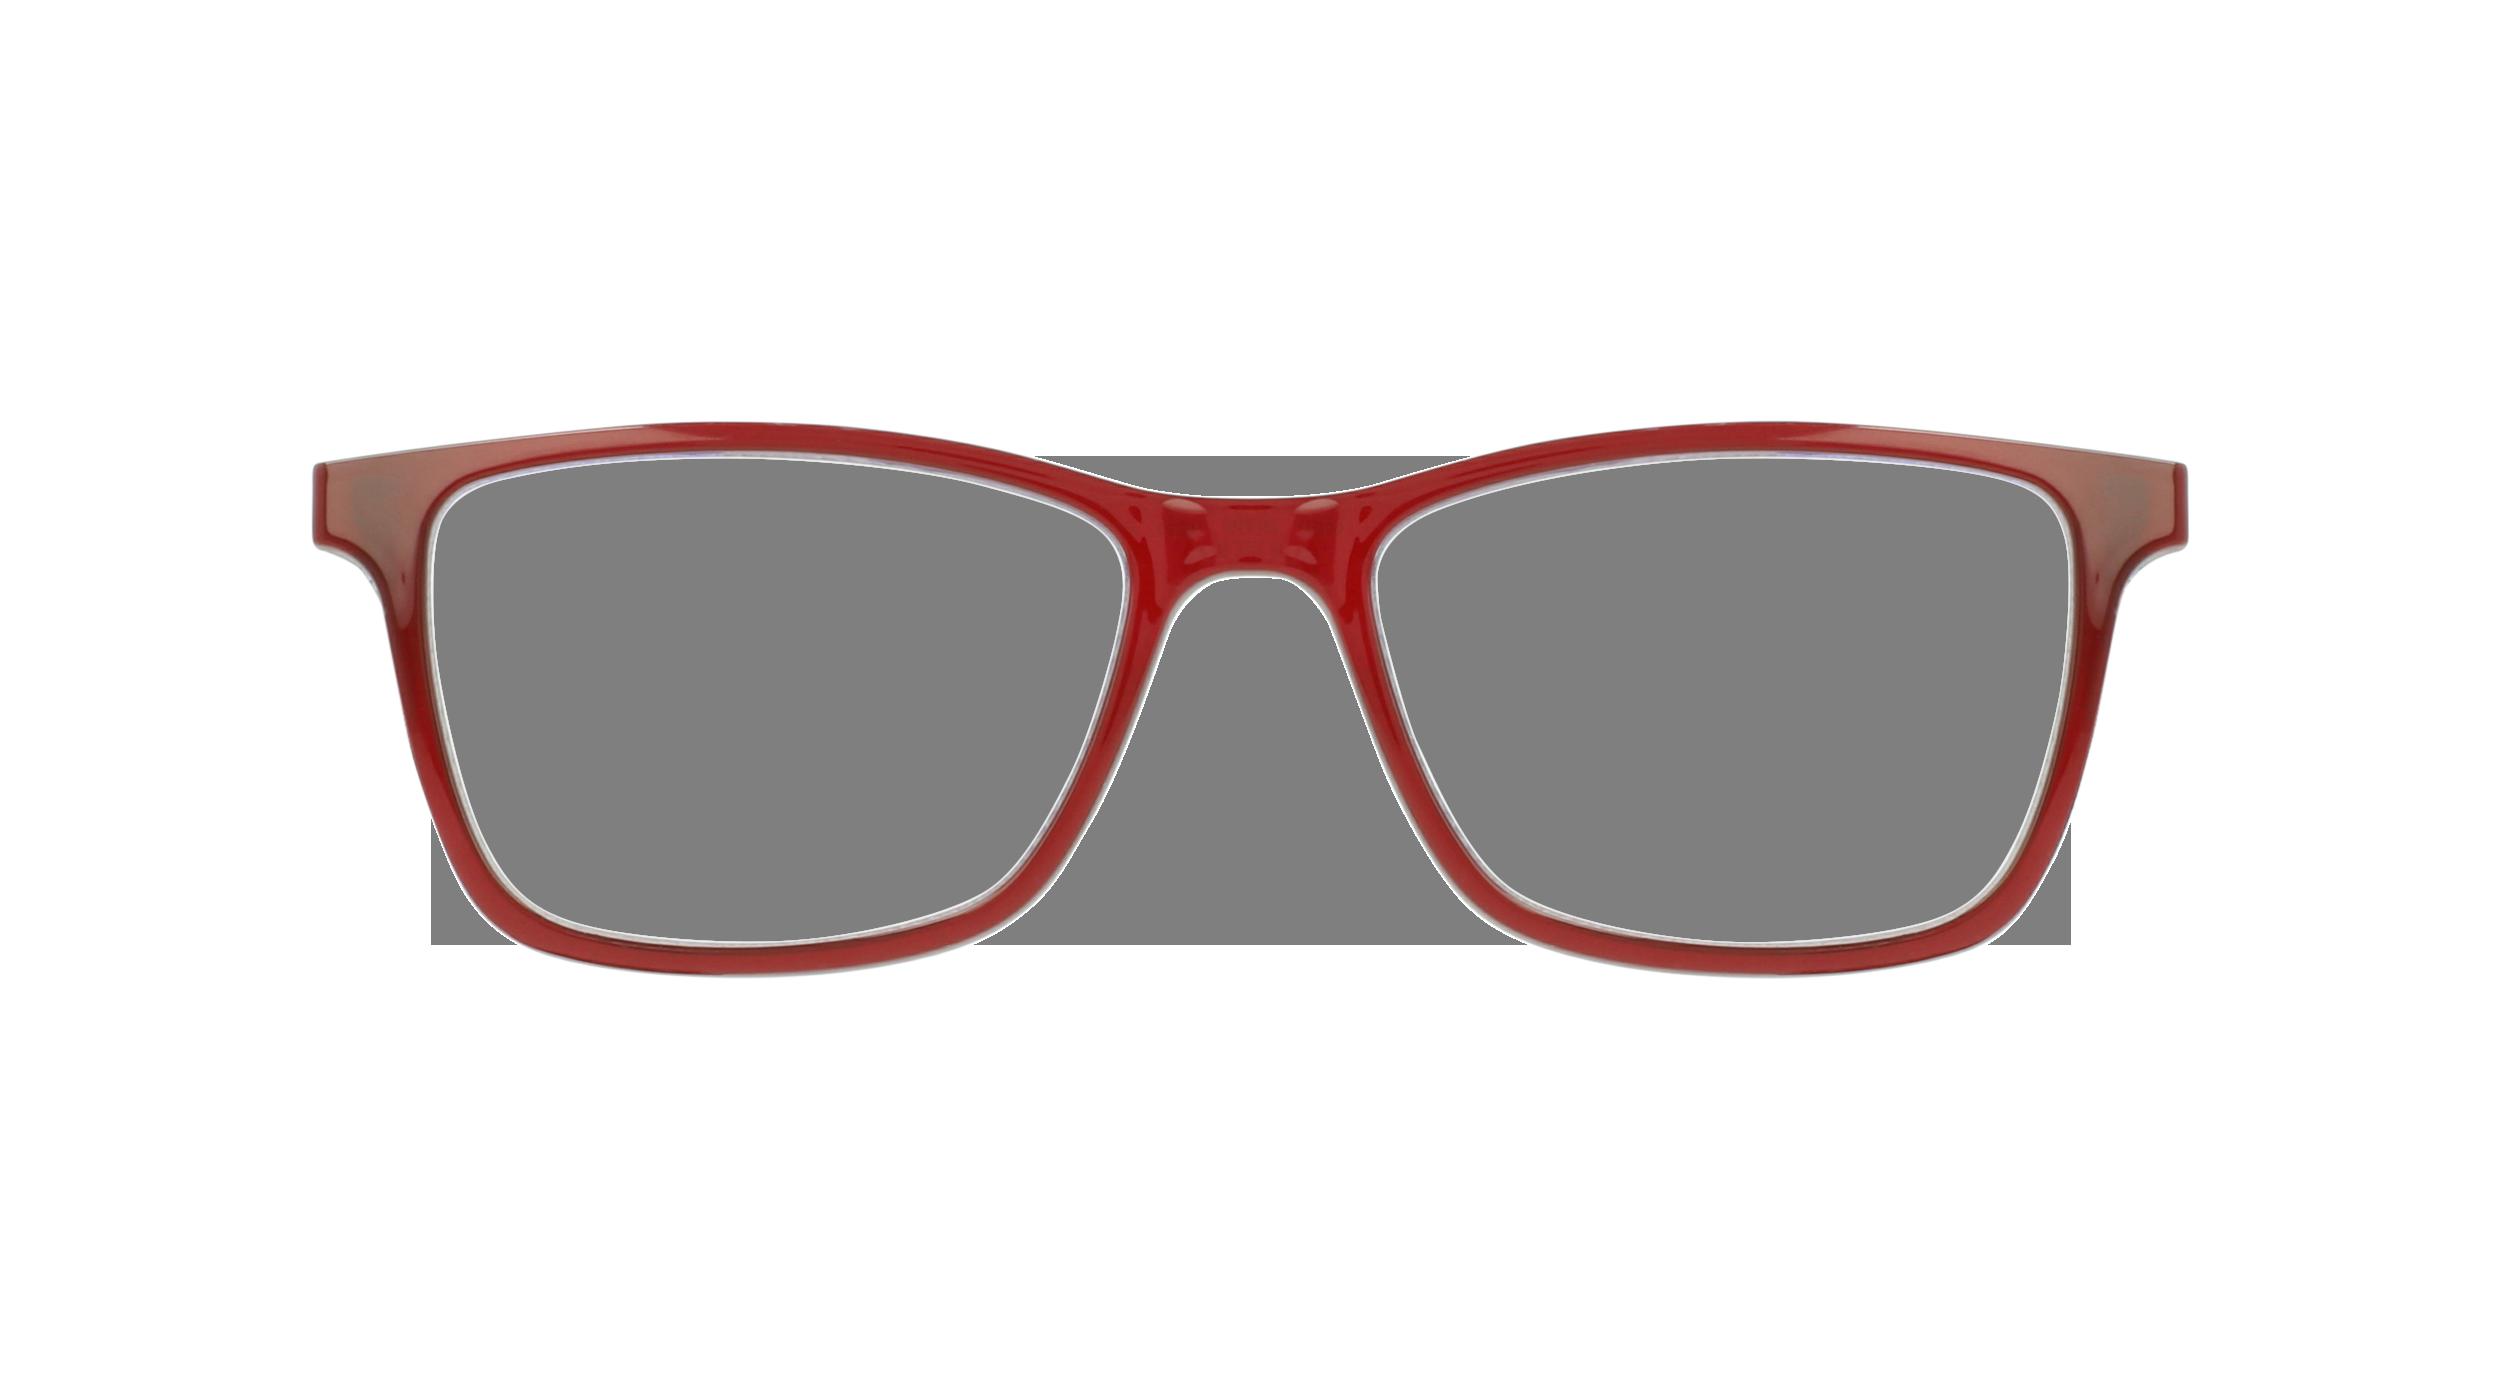 afflelou/france/products/smart_clip/clips_glasses/07630036457764.png